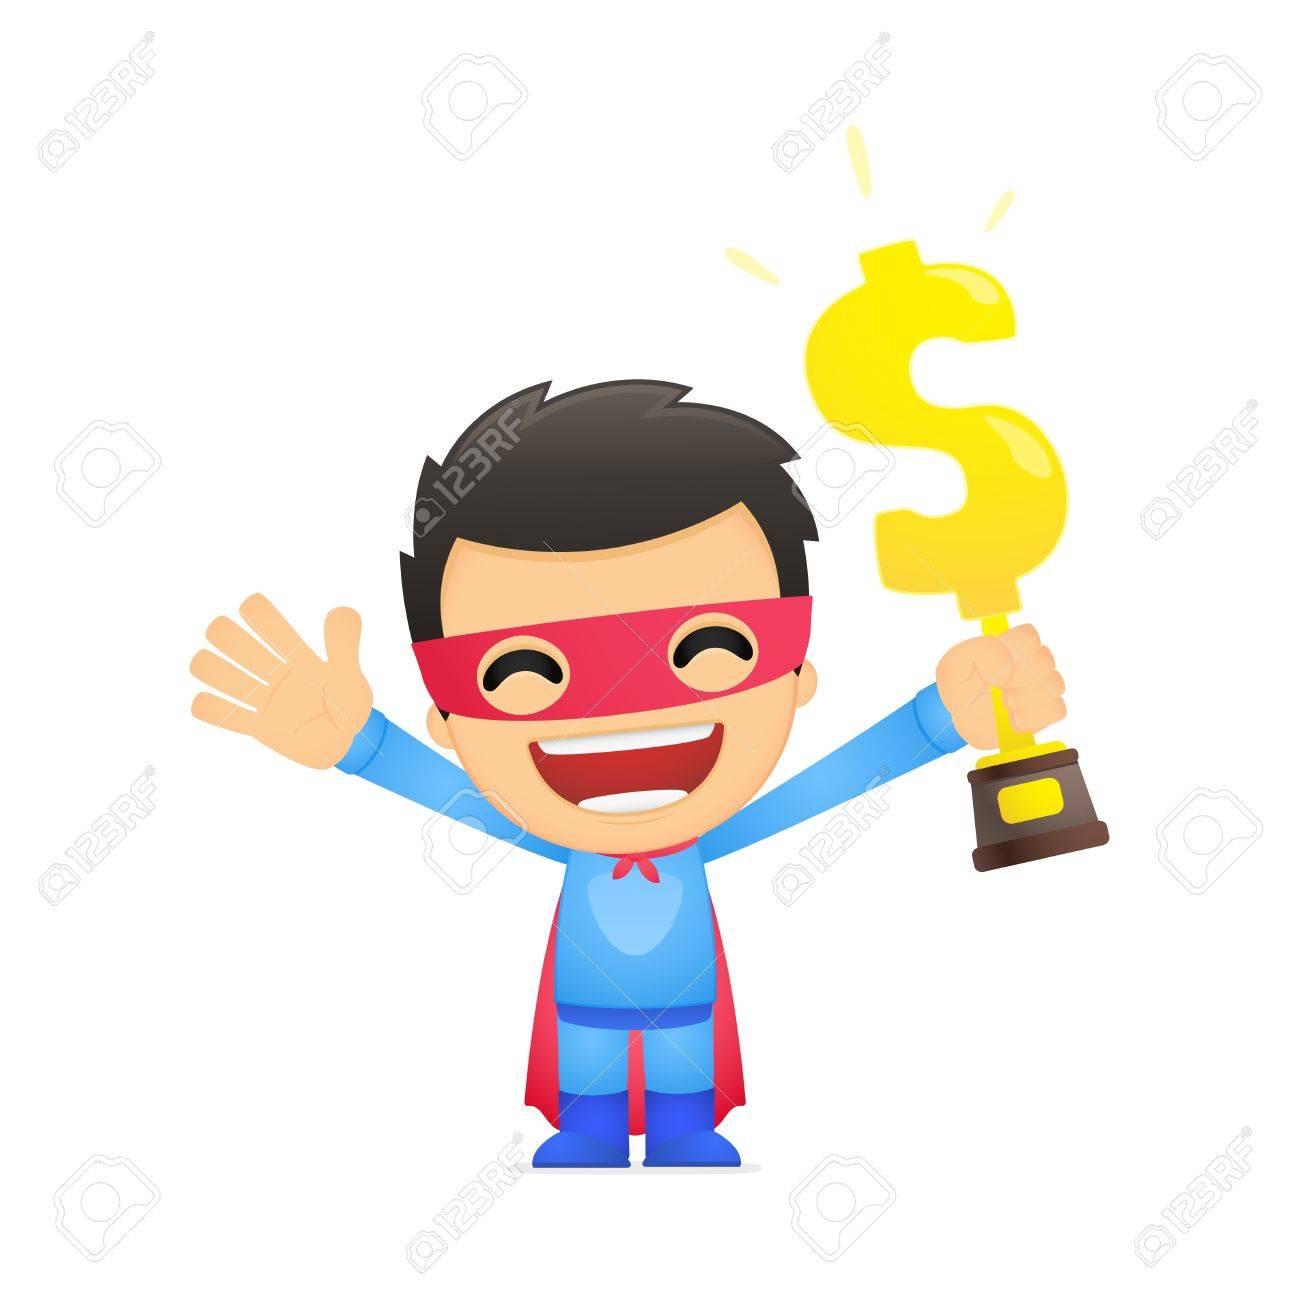 funny cartoon superhero Stock Vector - 13890305